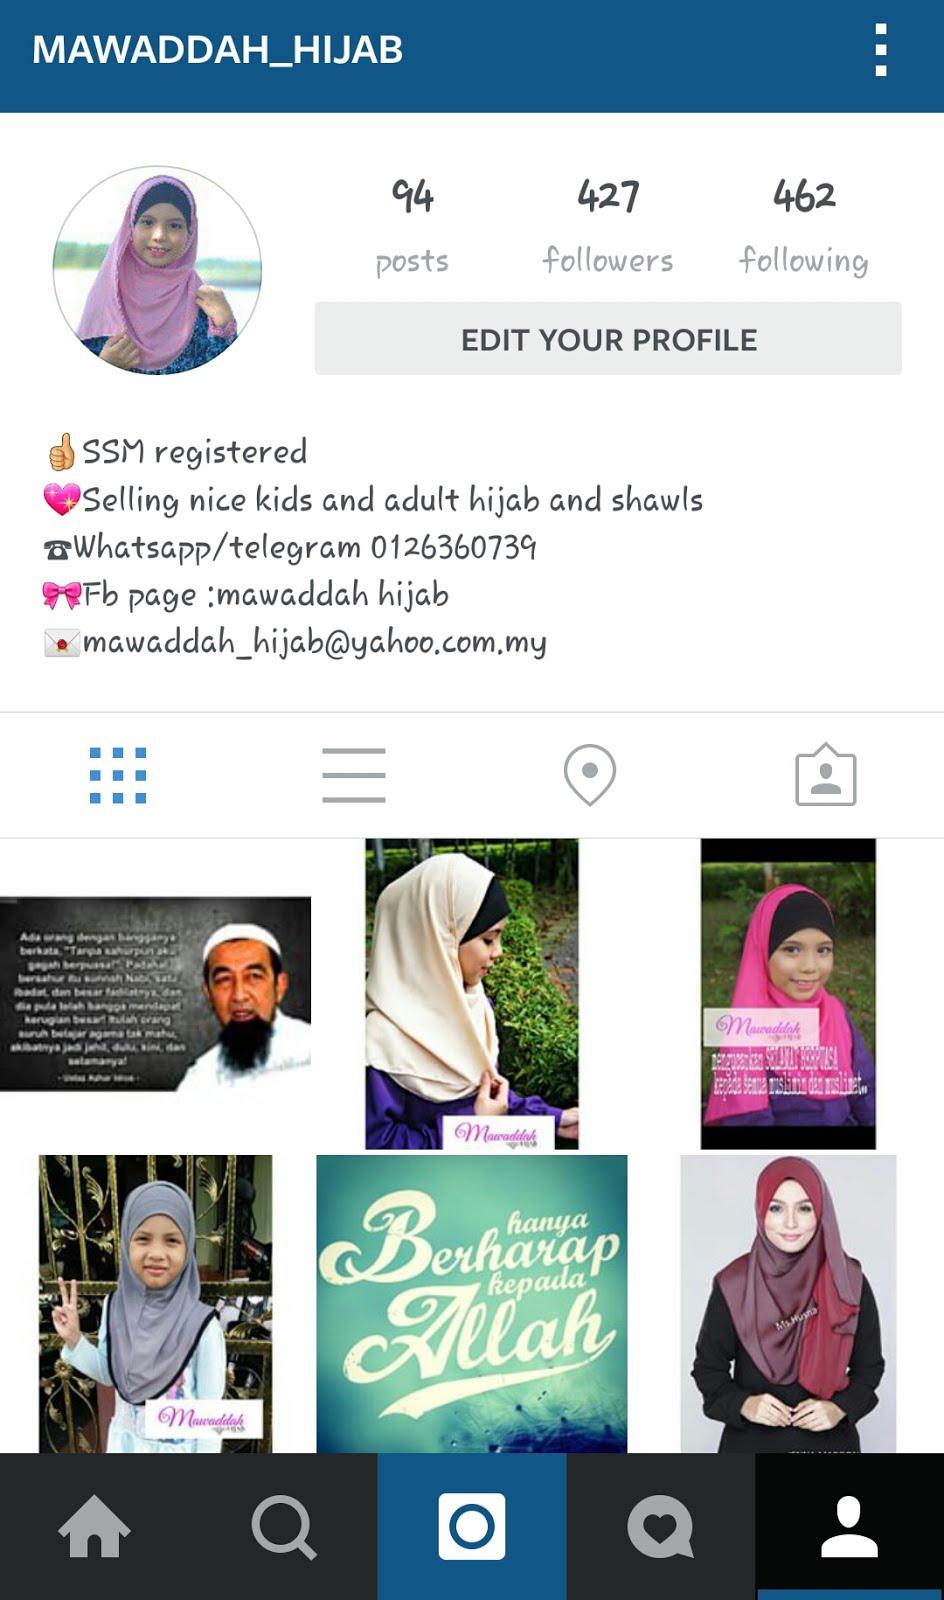 Mawaddah_hijab instagram